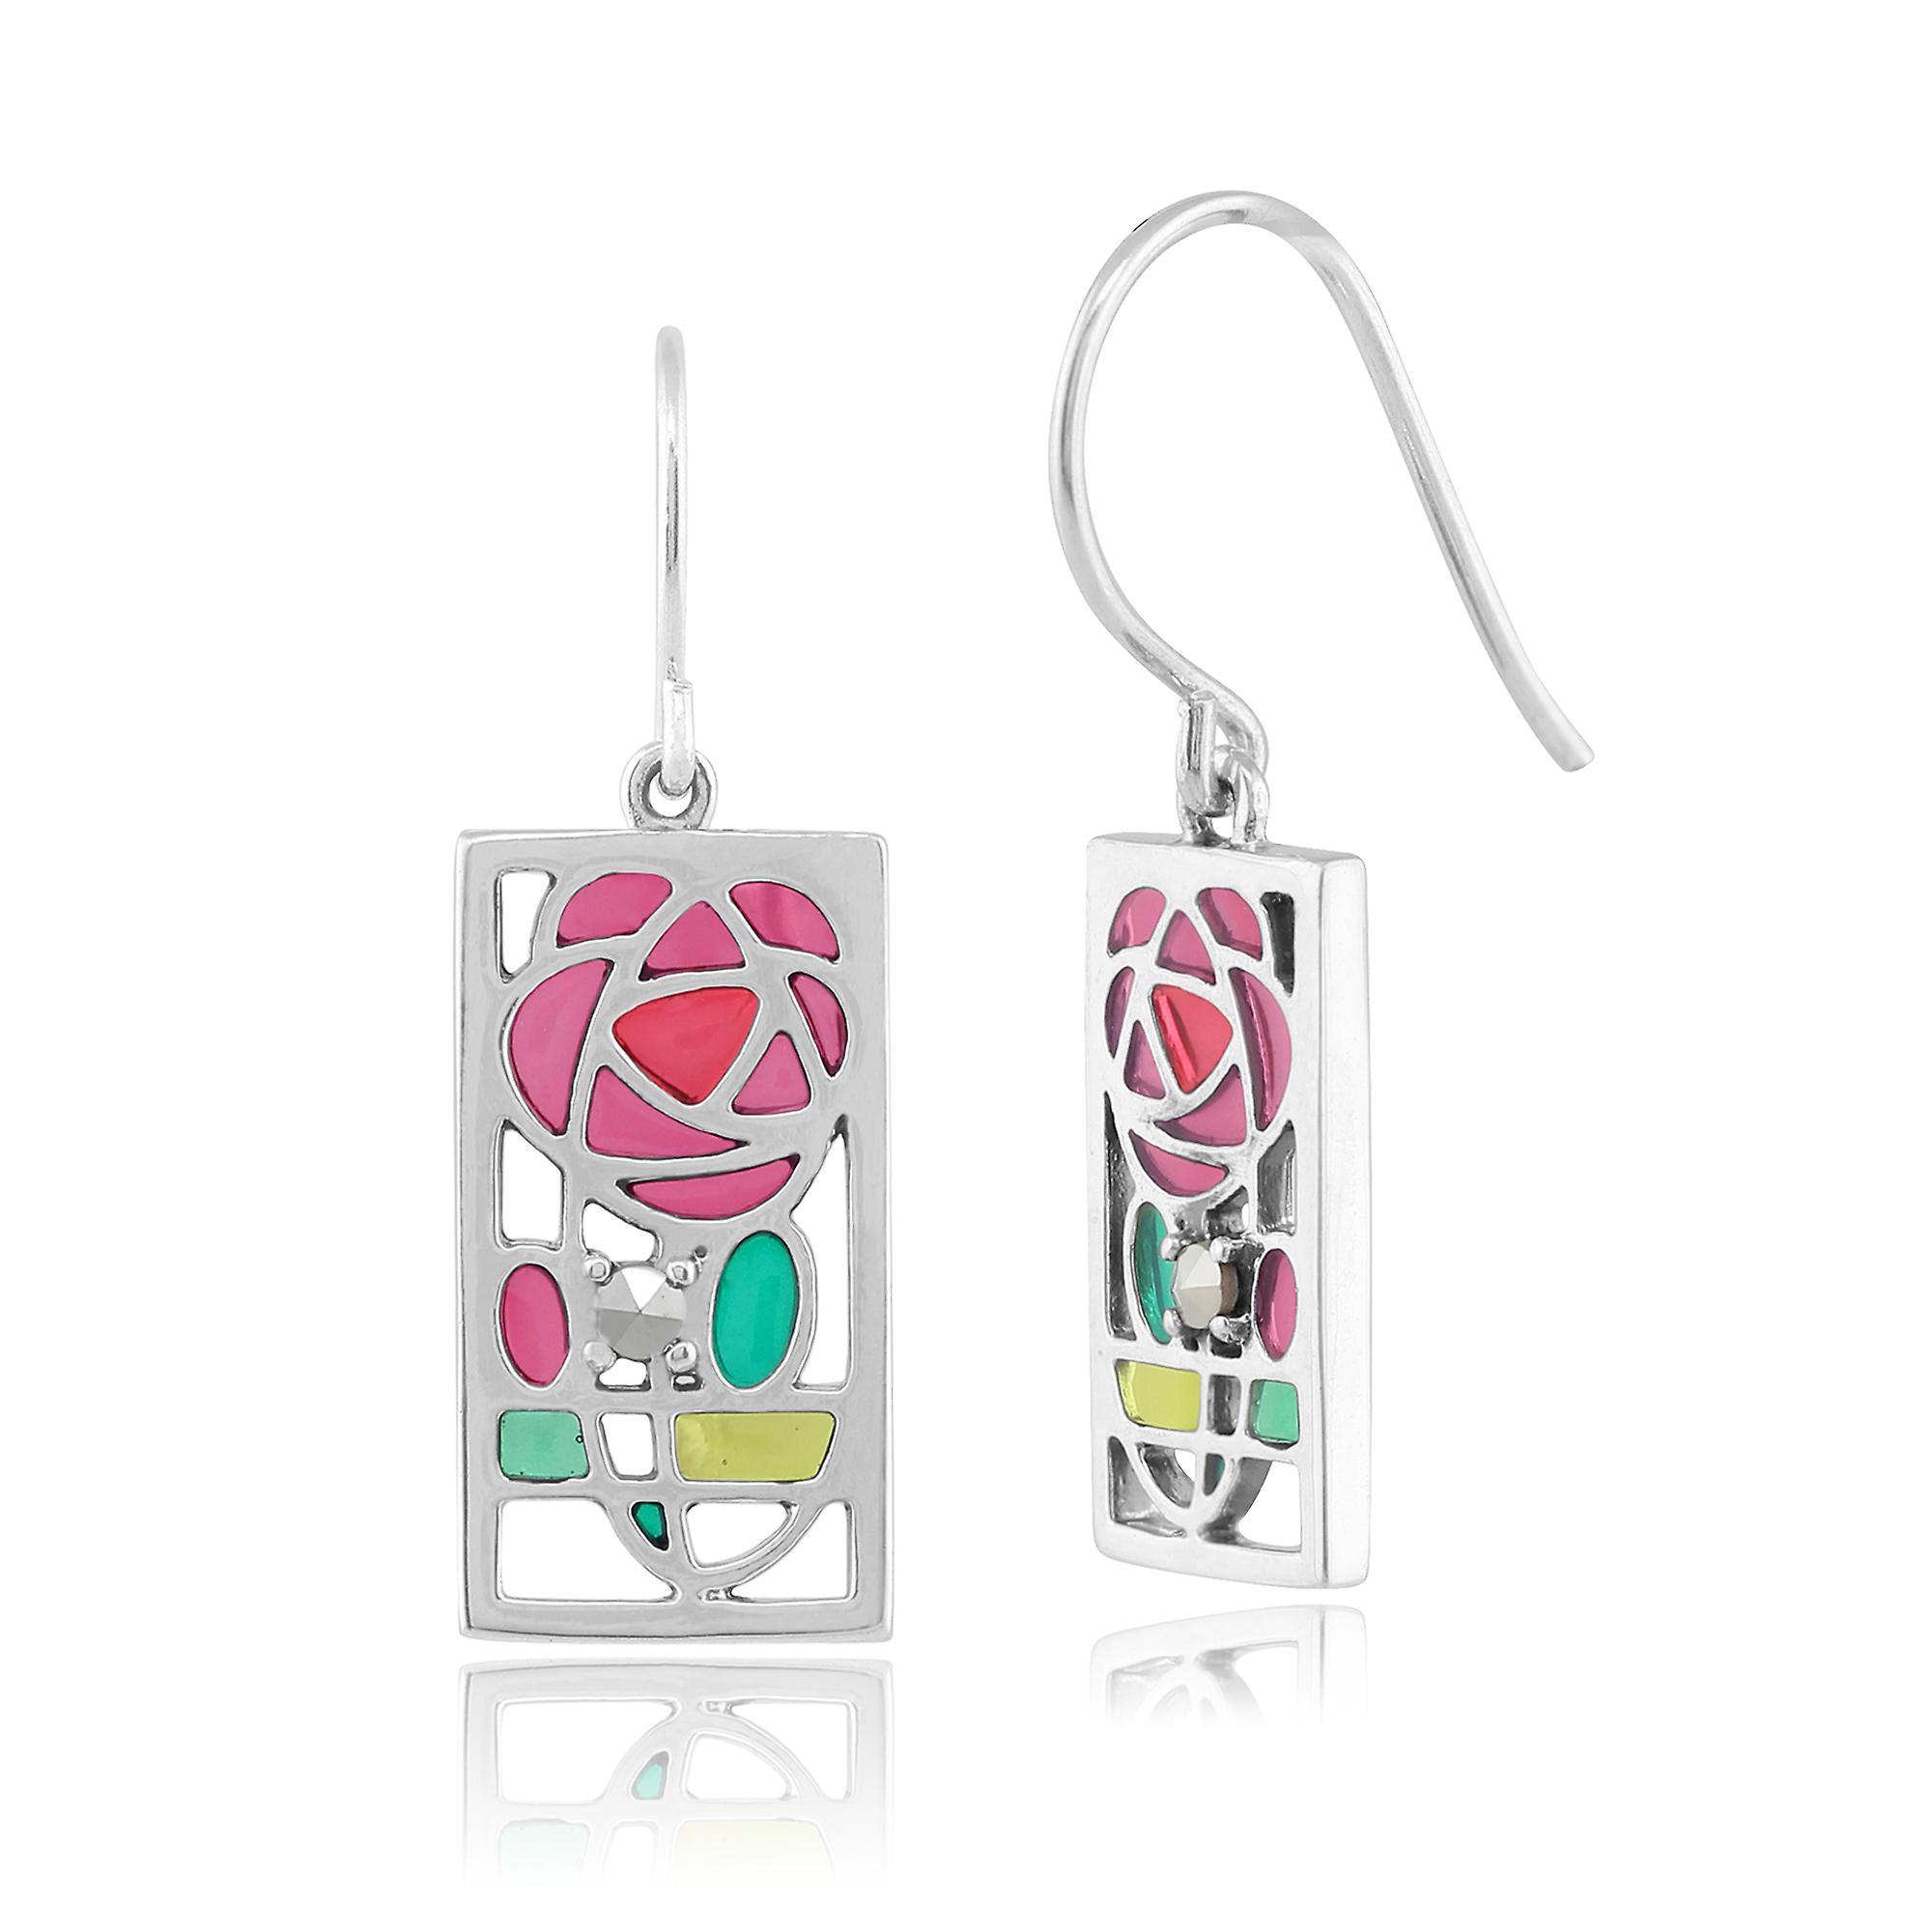 Gemondo Sterling Silver Marcasite Rennie Mackintosh Rose Style Drop Earrings